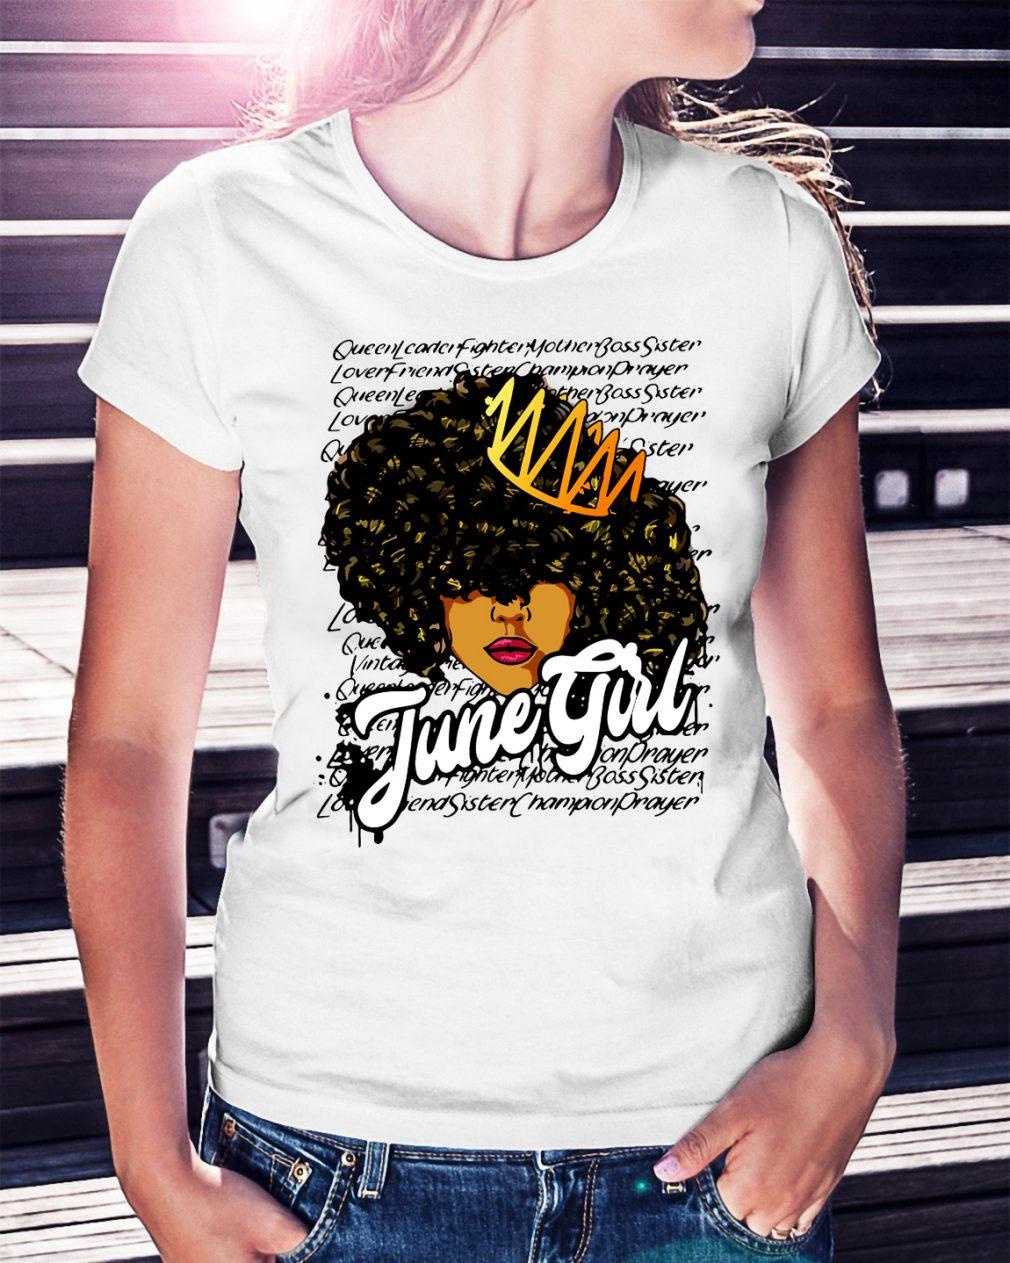 Queen leader fighter mother boss sister June girl shirt